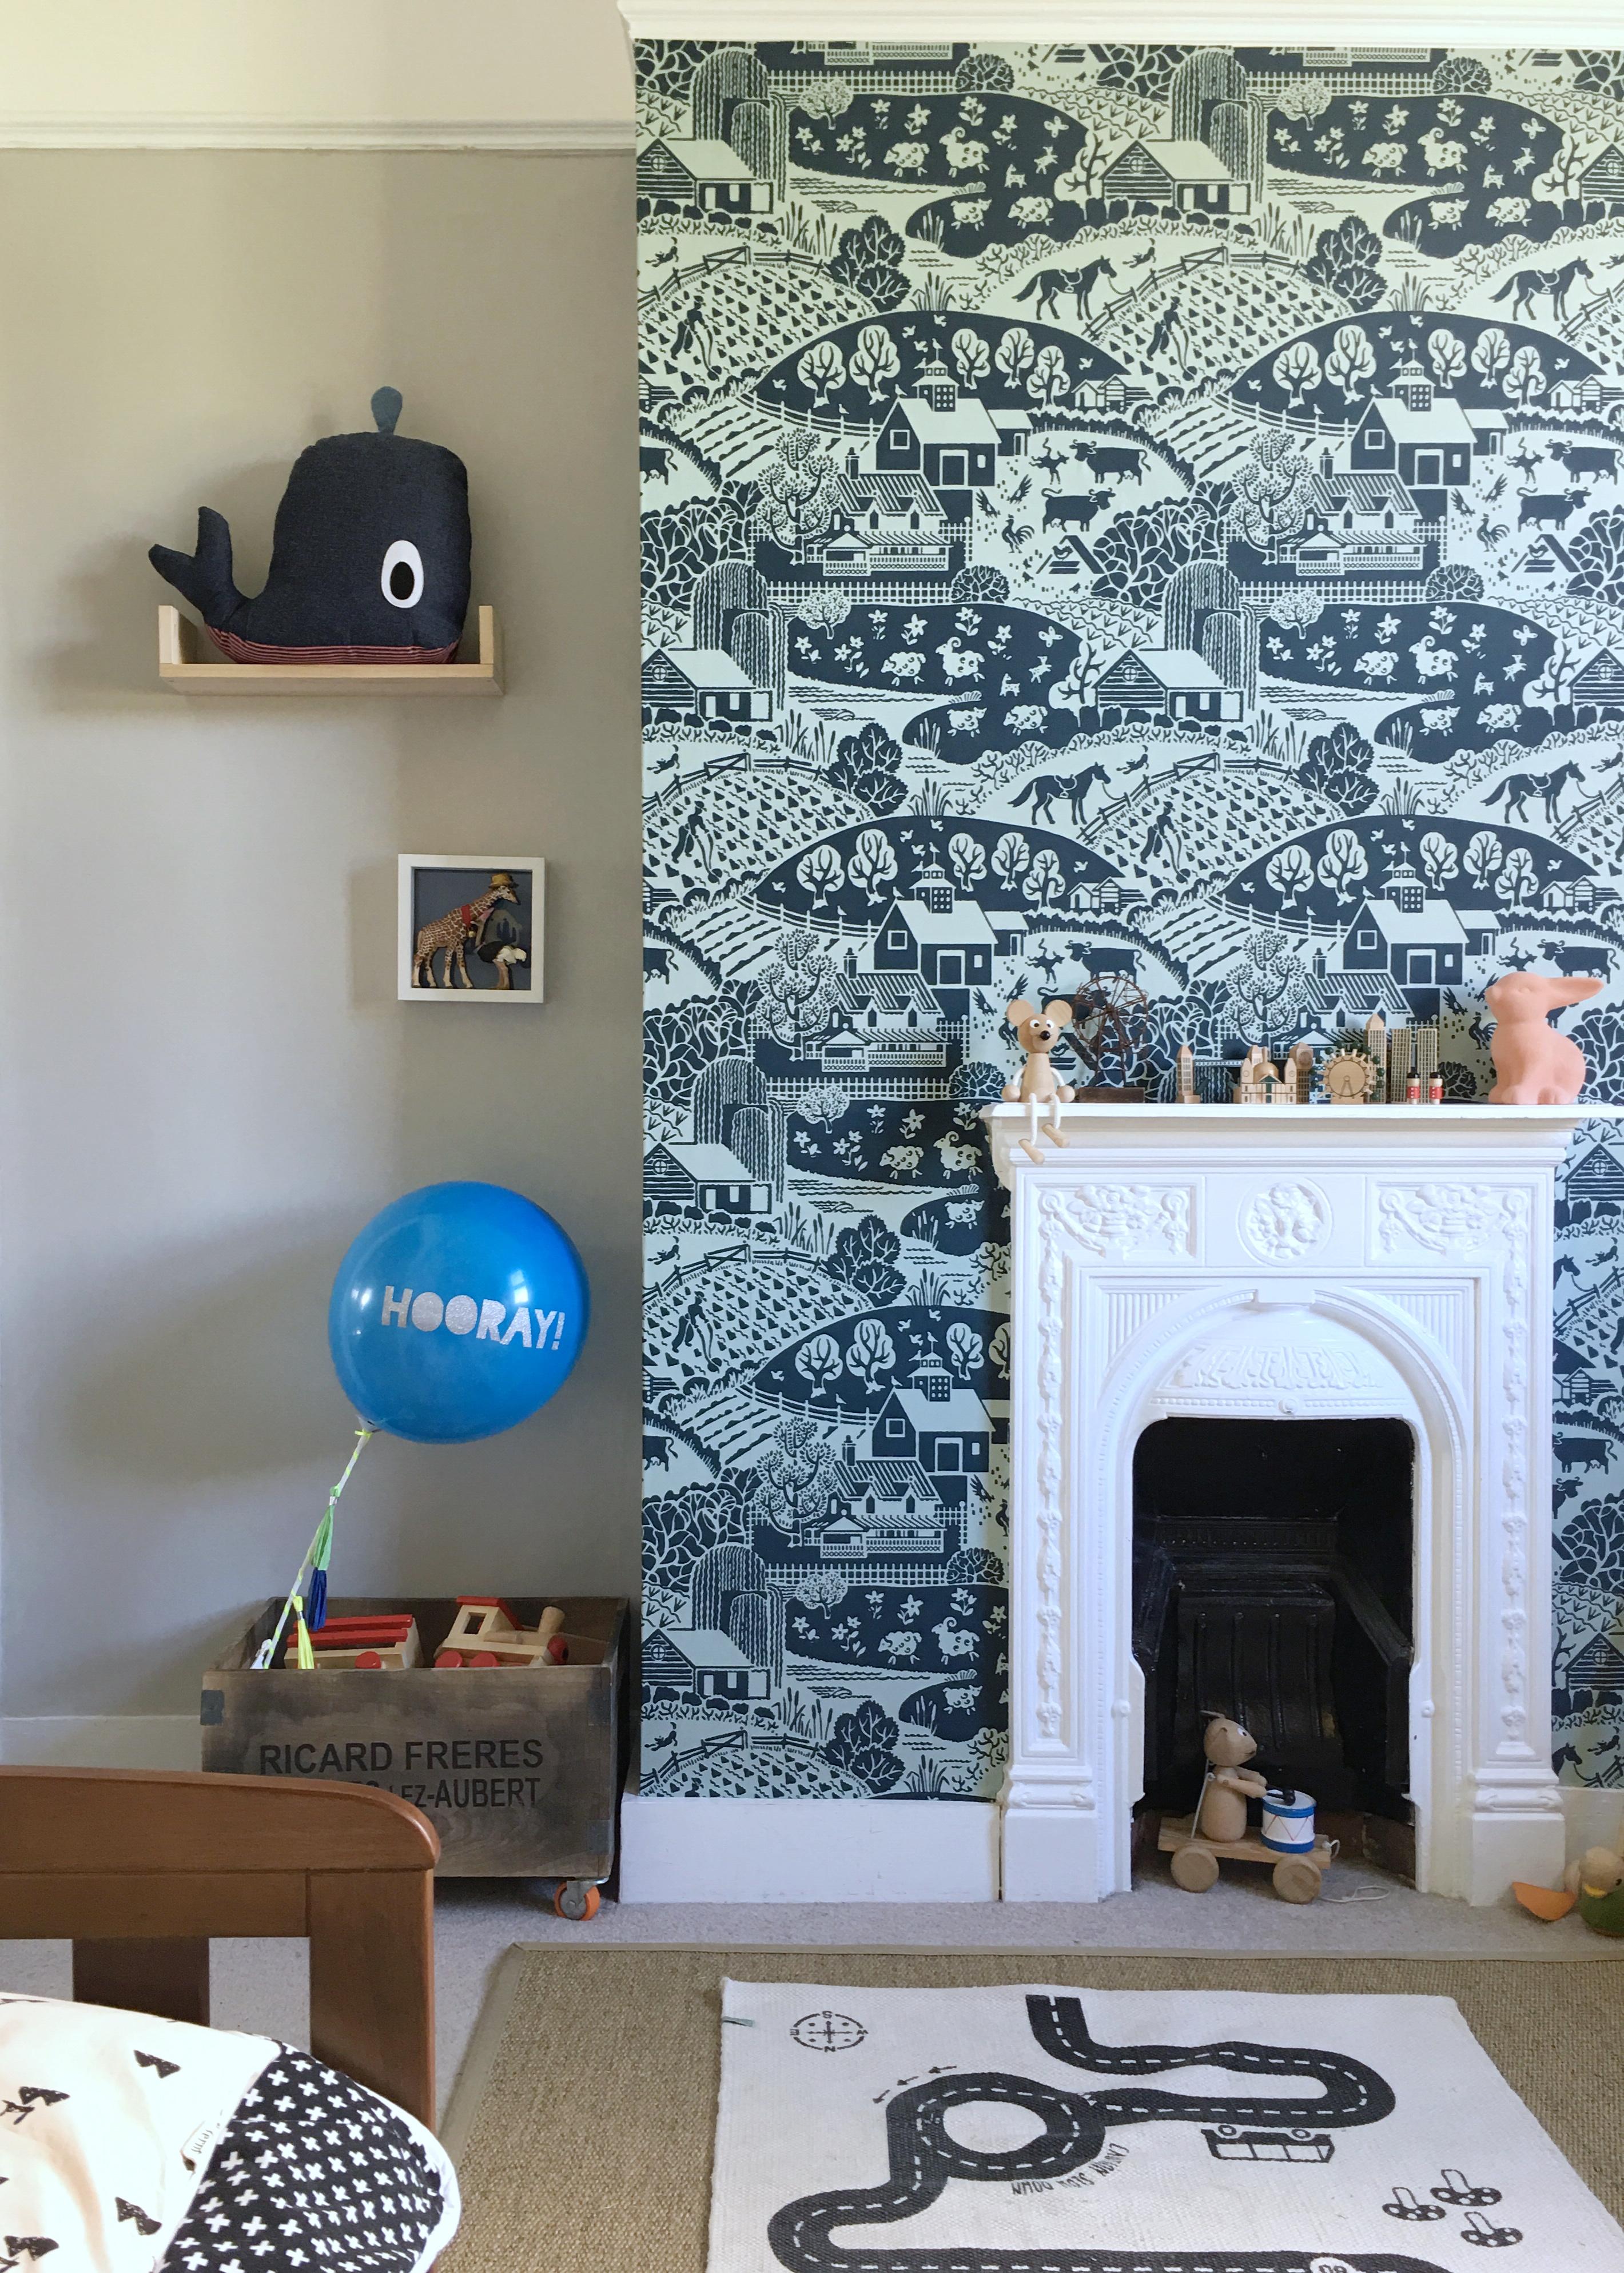 Farrow Ball Gable Wallpaper Interior Ideas, Childrens Room Decor With A  Scandi Monochrome Scheme,